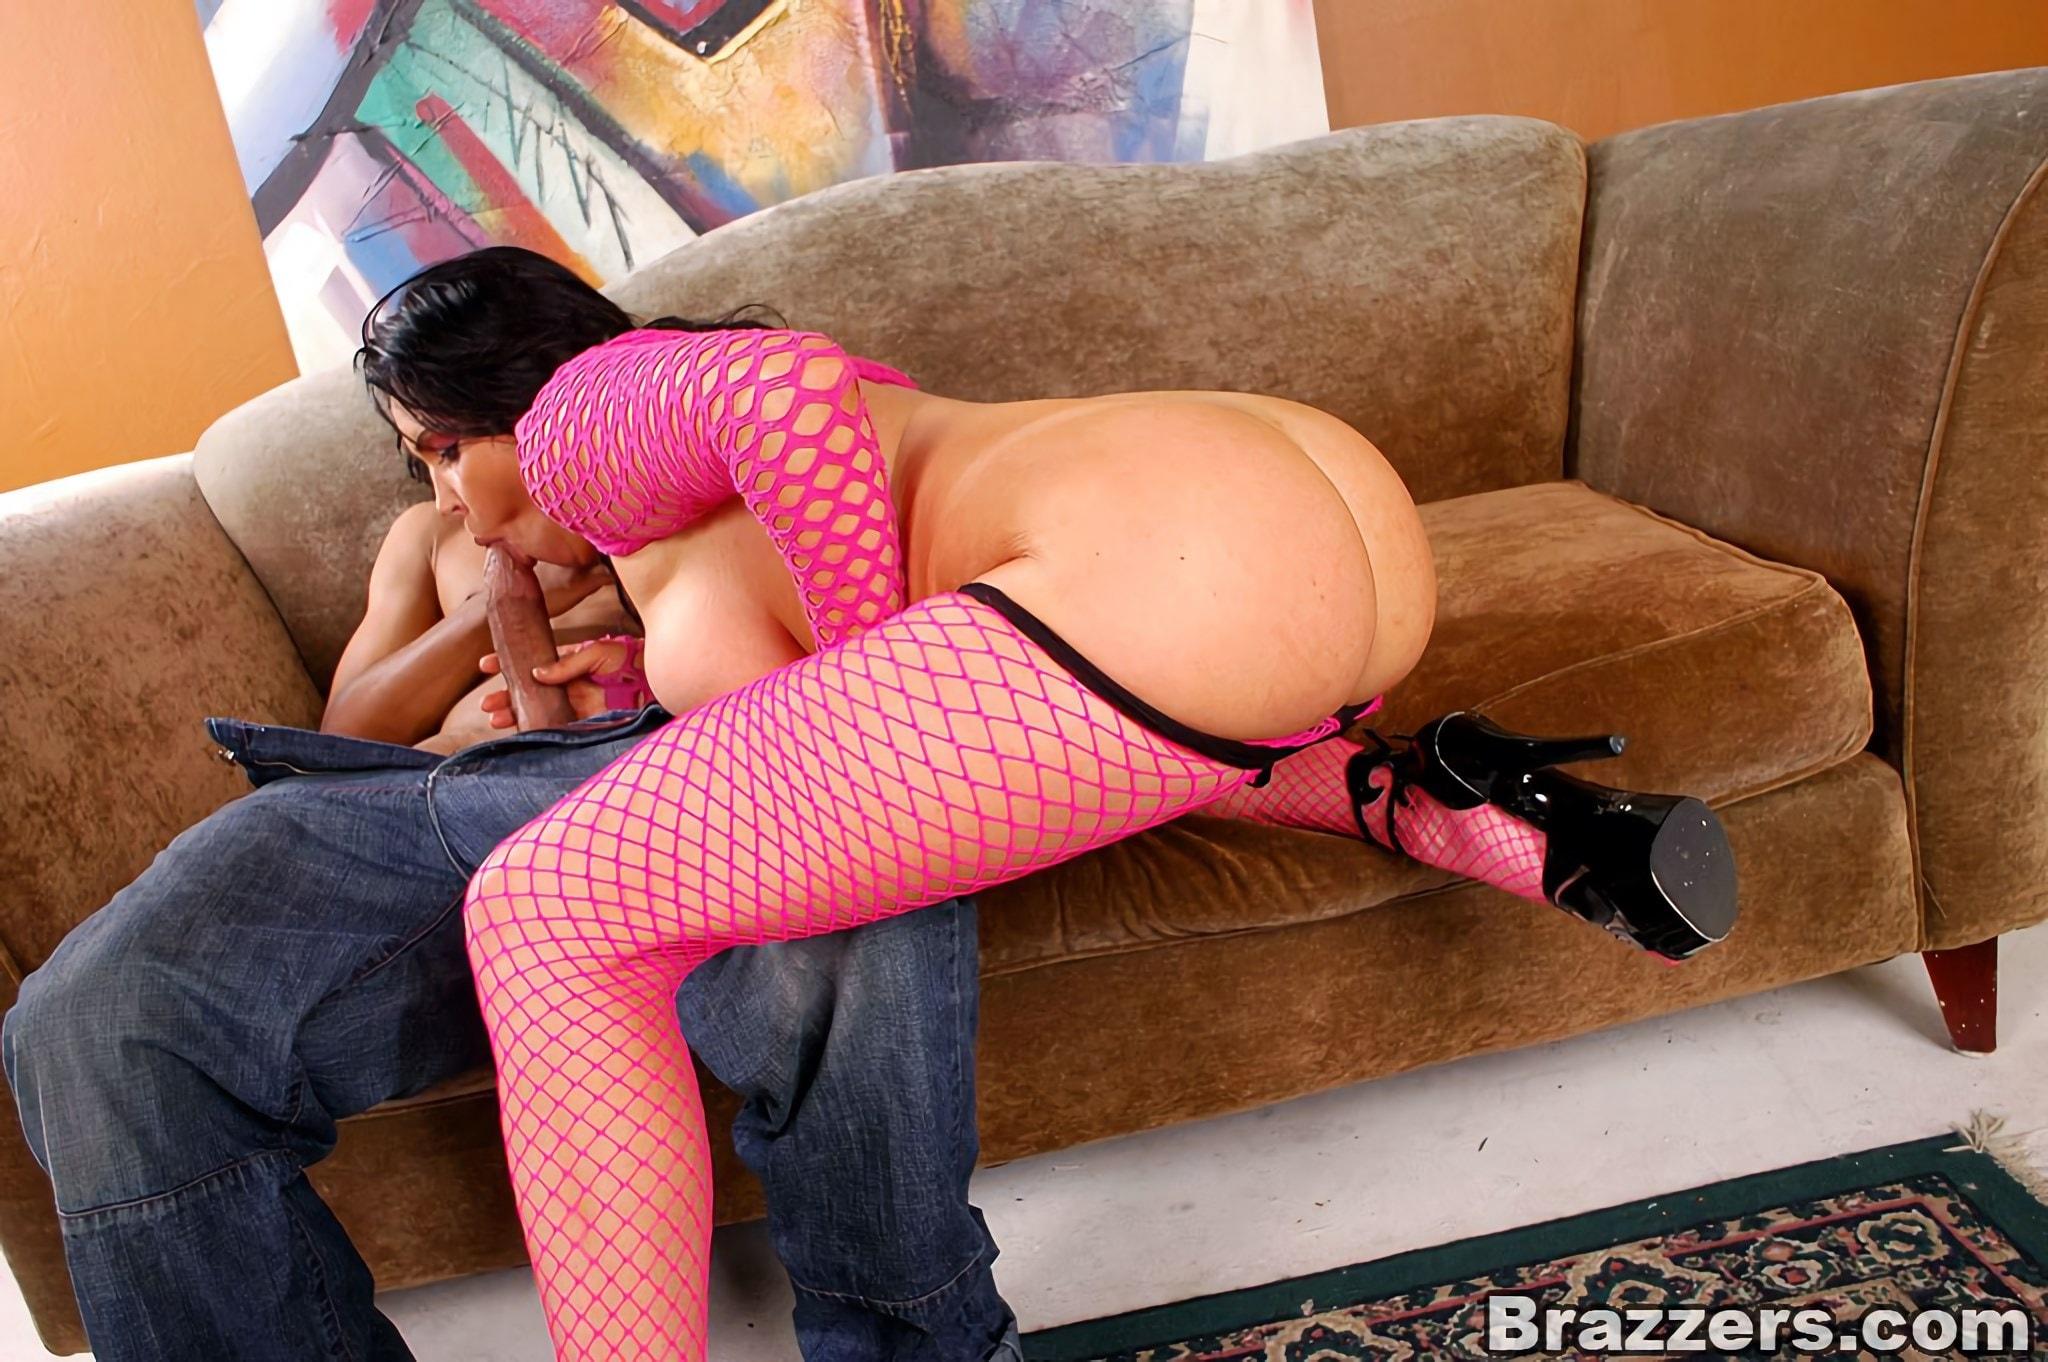 Brazzers 'Big Ass Big Tits' starring Angelica Sin (Photo 8)